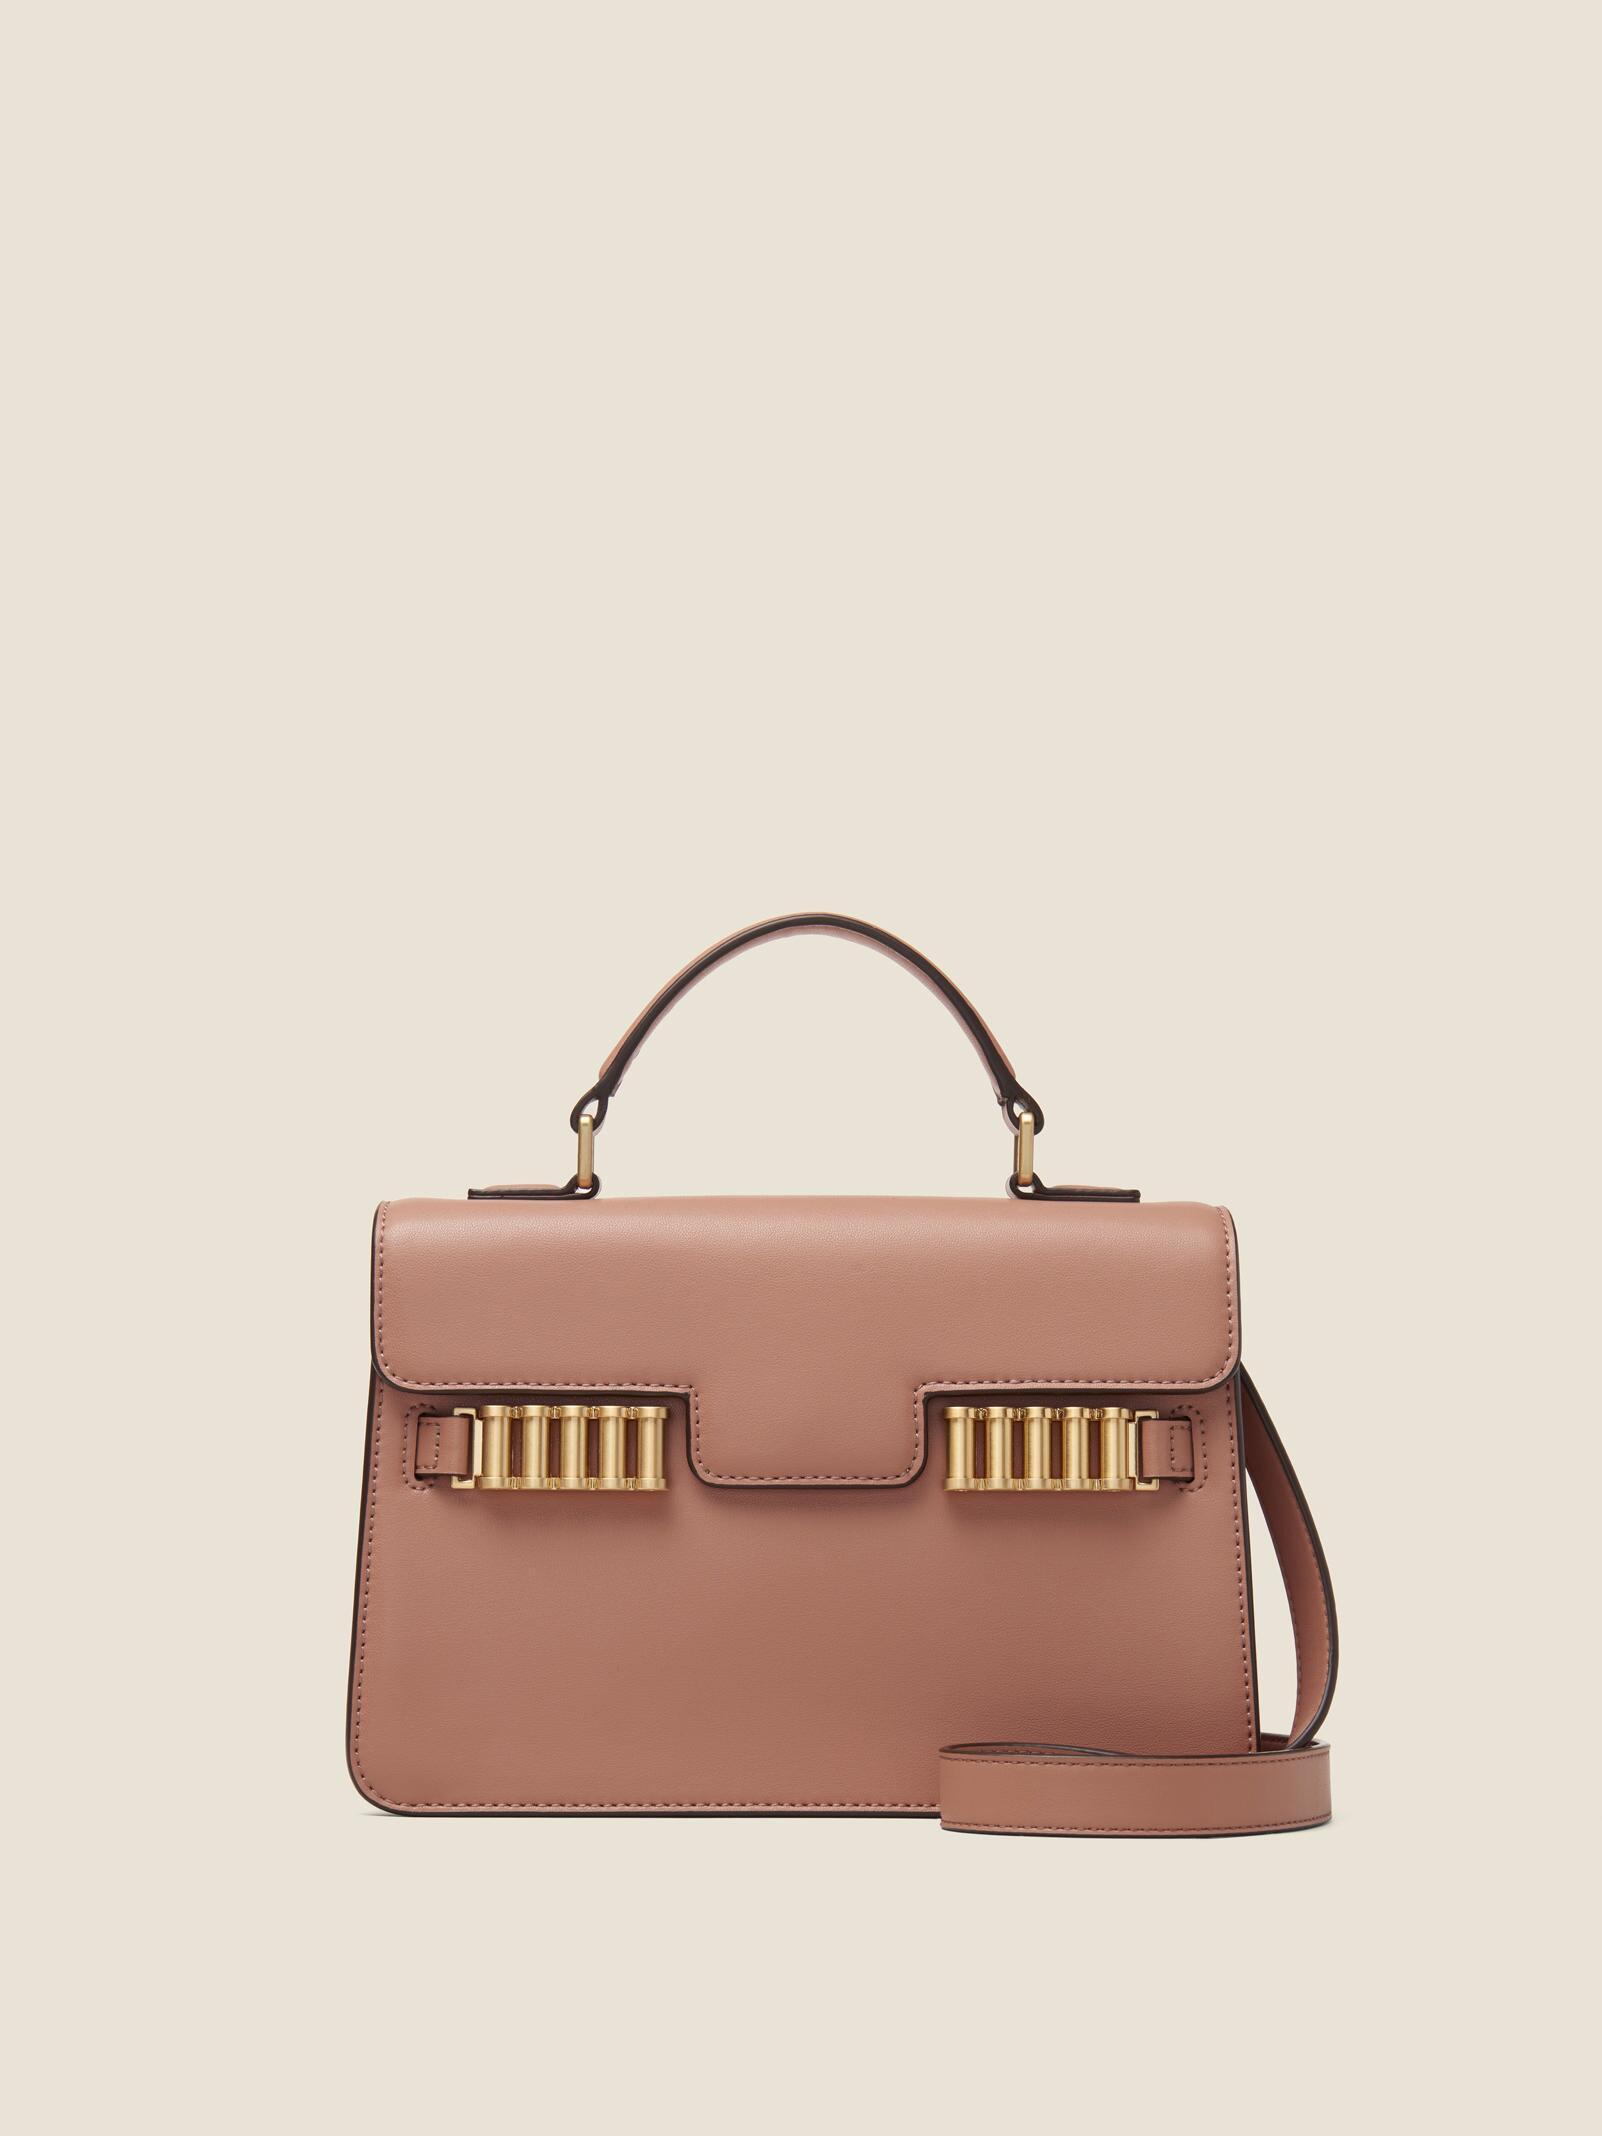 047c663dec88 Lyst - DKNY Paola Leather Crossbody